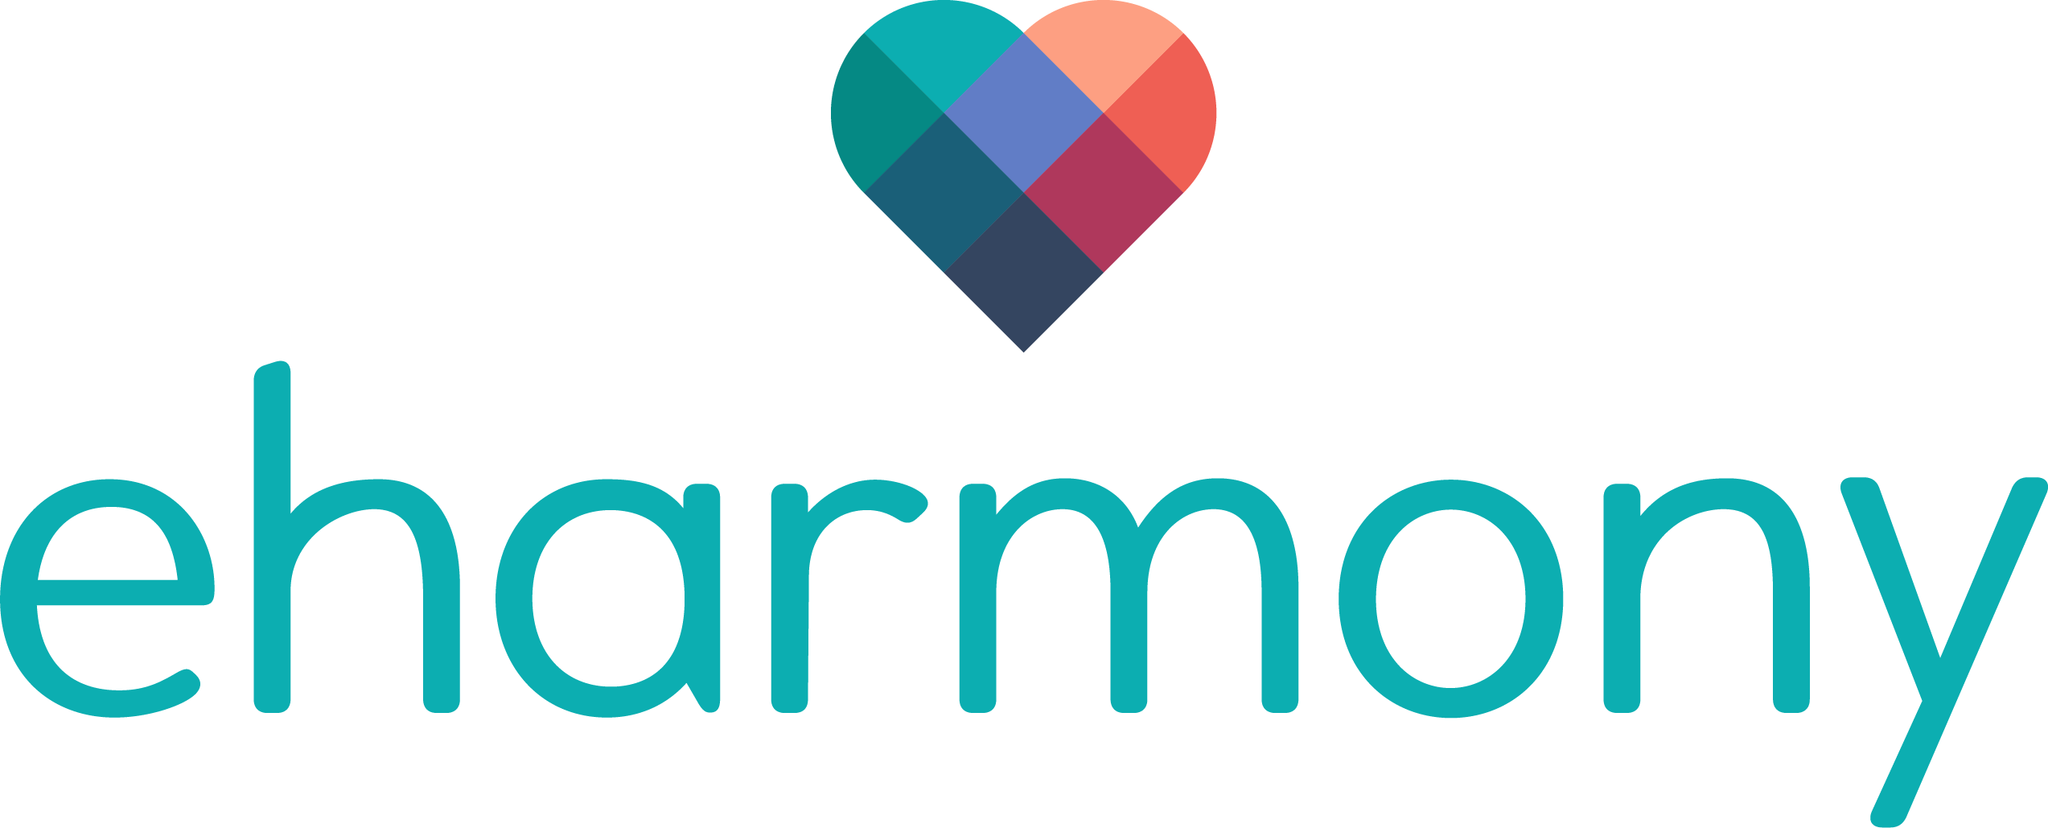 eharmony Updated Heart Logo 2 - 2048x828